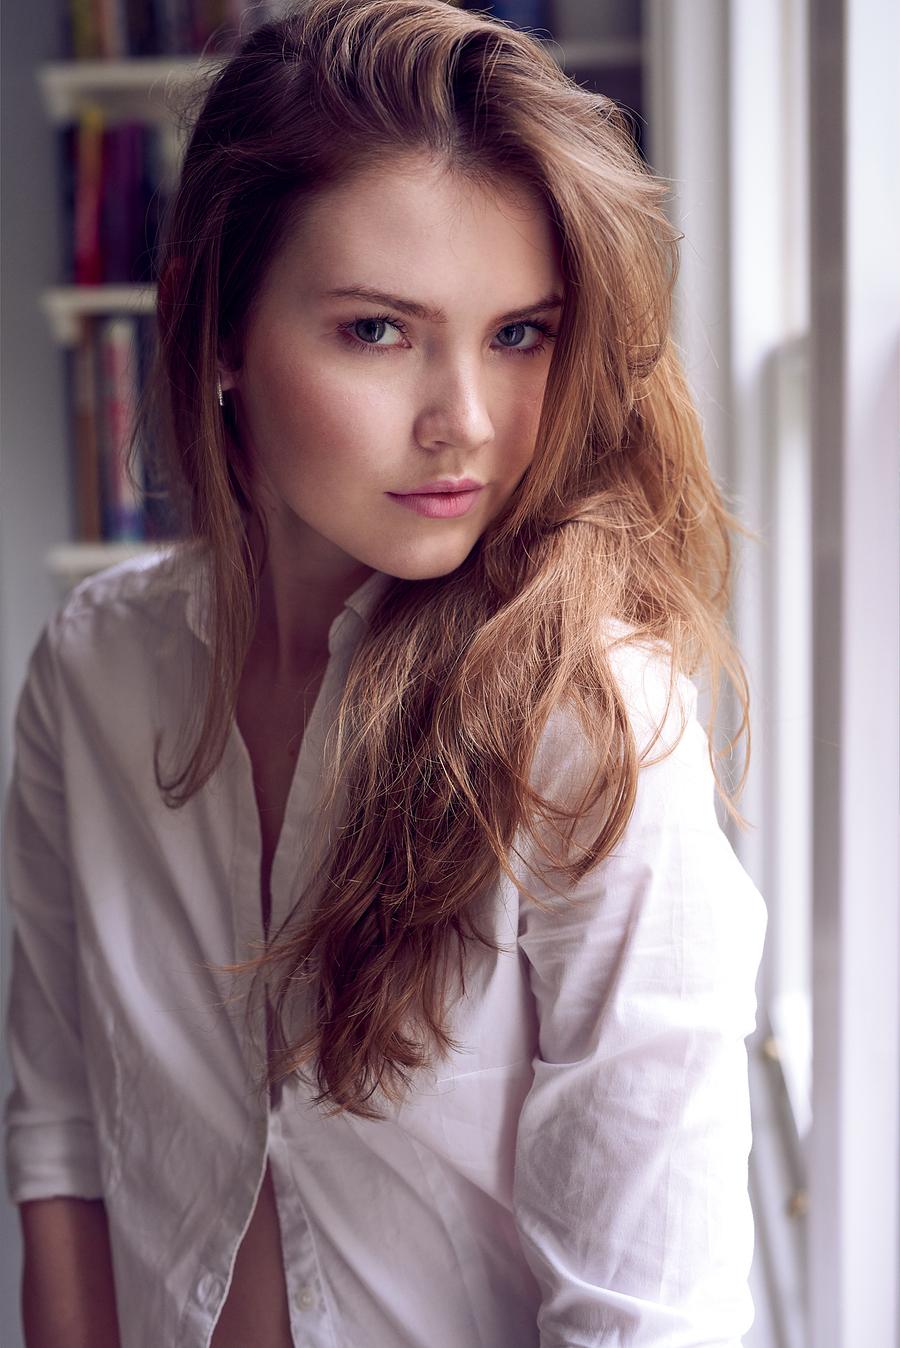 Model Chloe. / Uploaded 25th October 2017 @ 12:23 PM